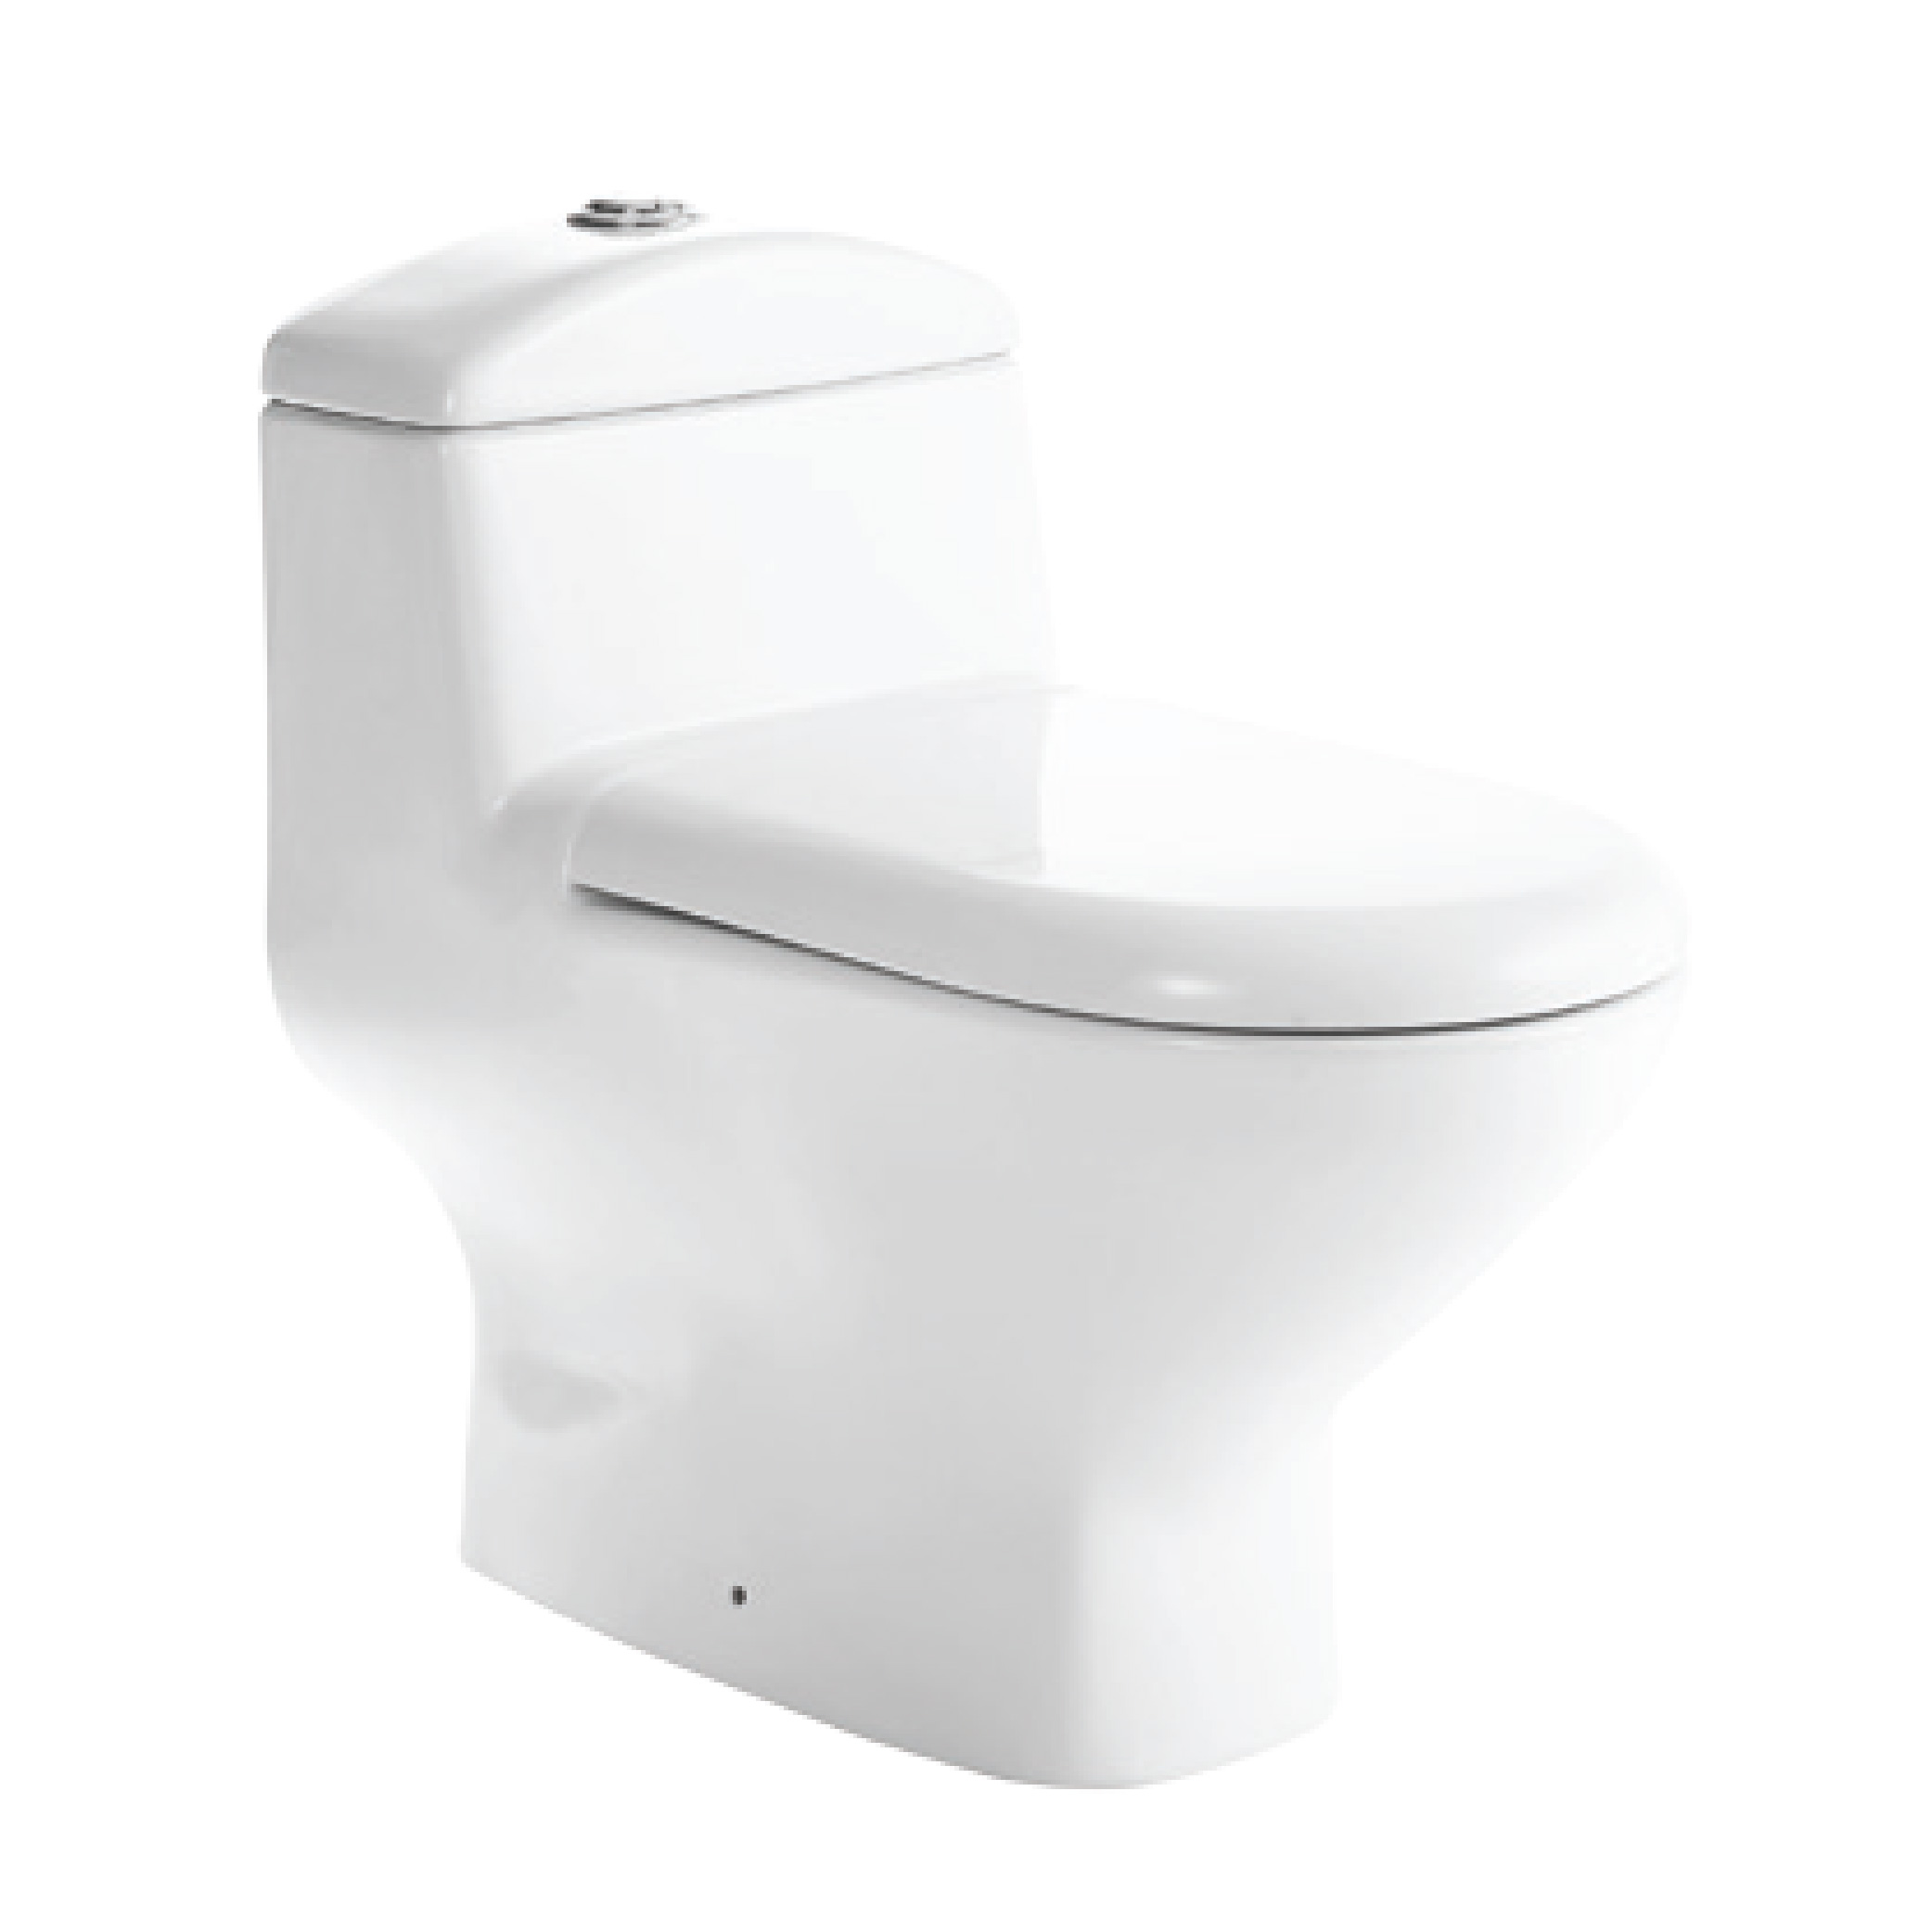 BỒN CẦU CARANO 1 KHỐI MP8110 ( Toilet model: MP8110 )